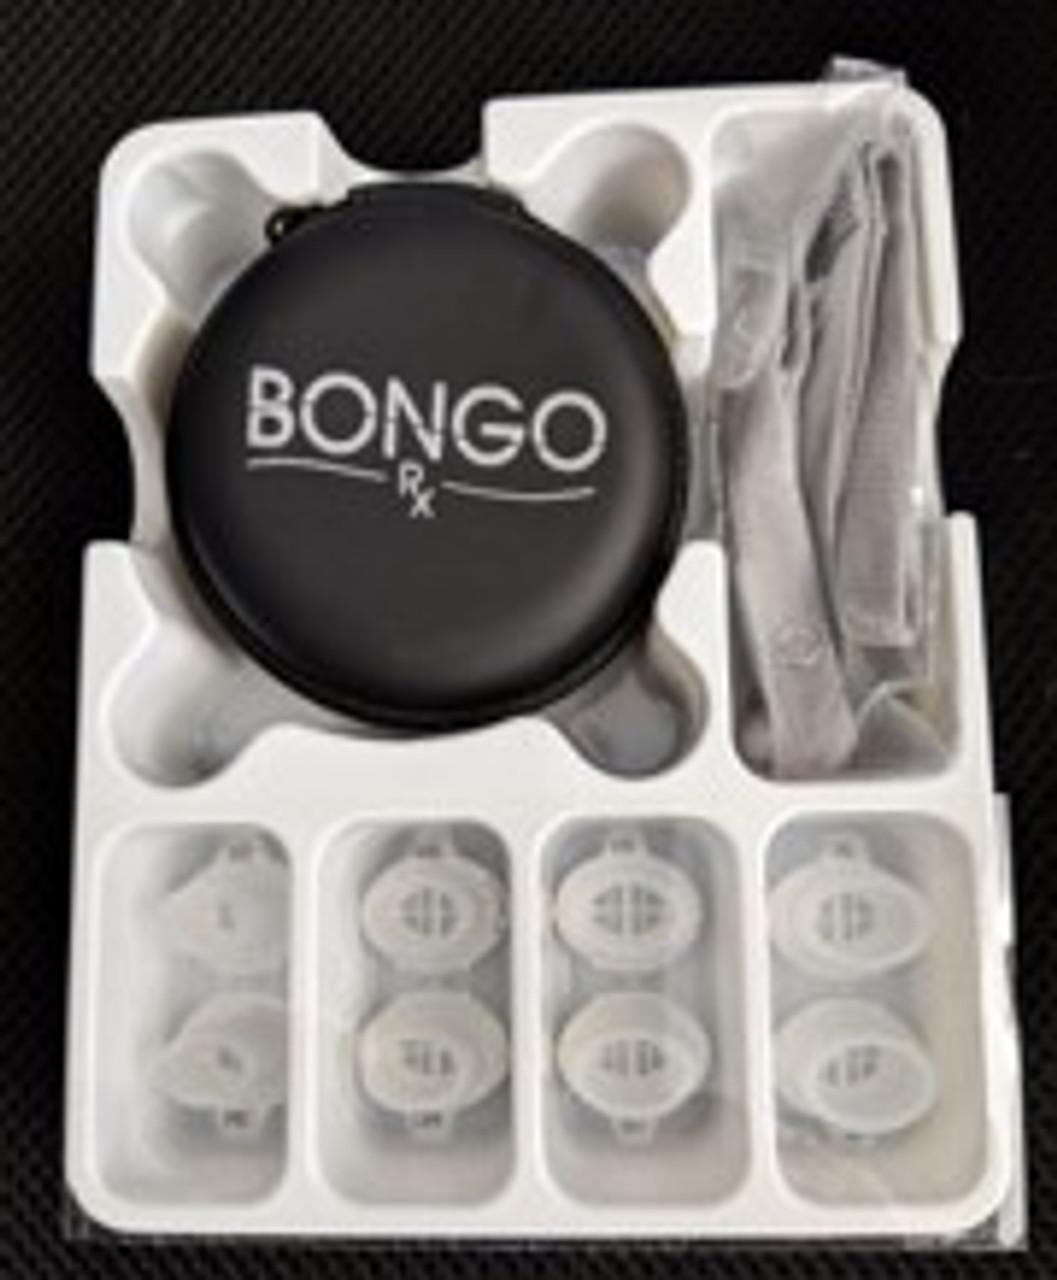 BongoRx